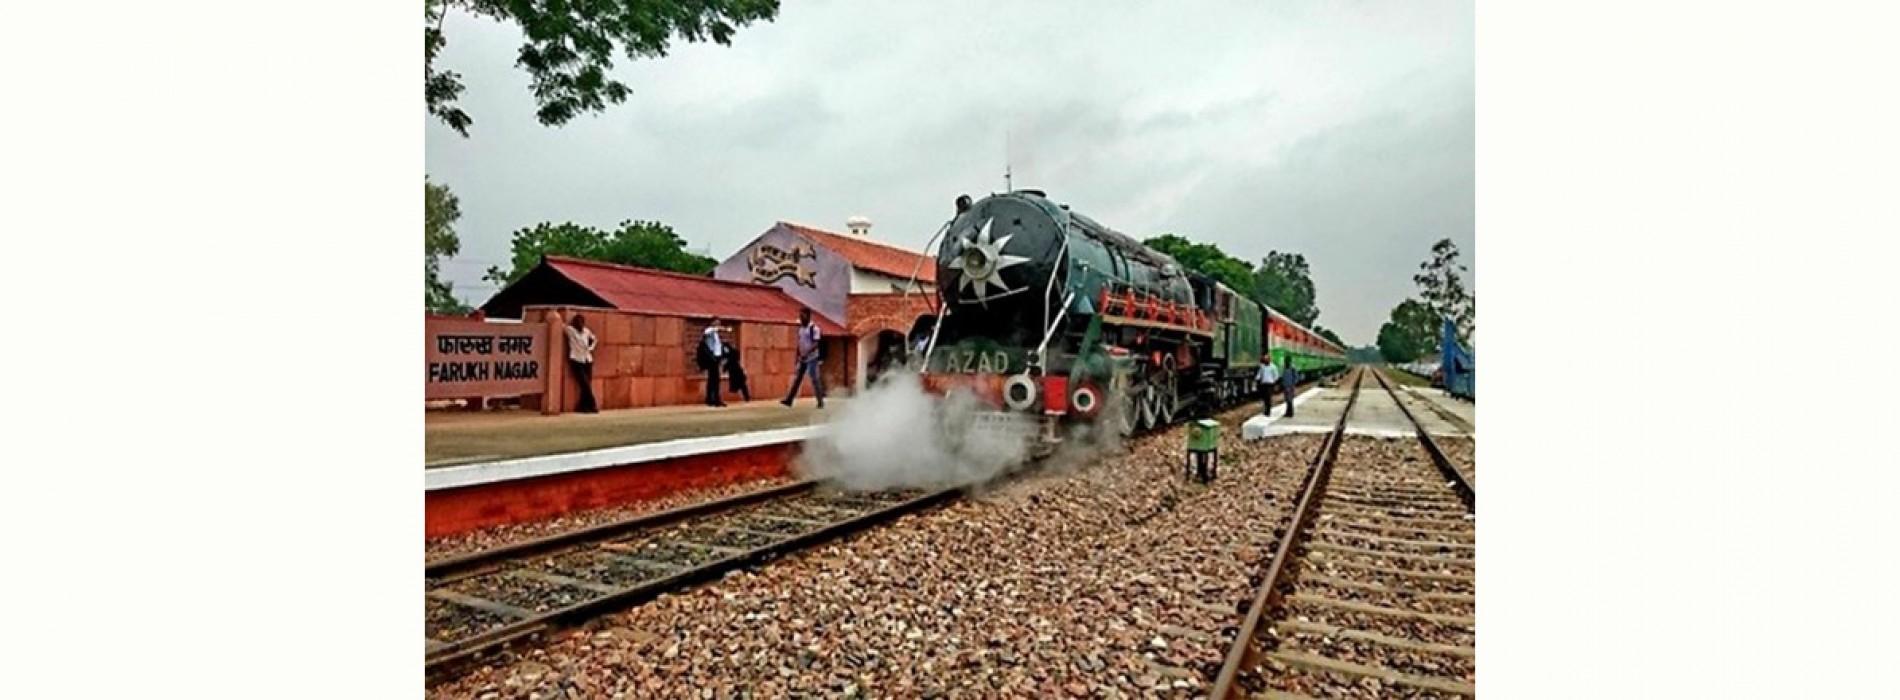 Northern Railway launches heritage steam train